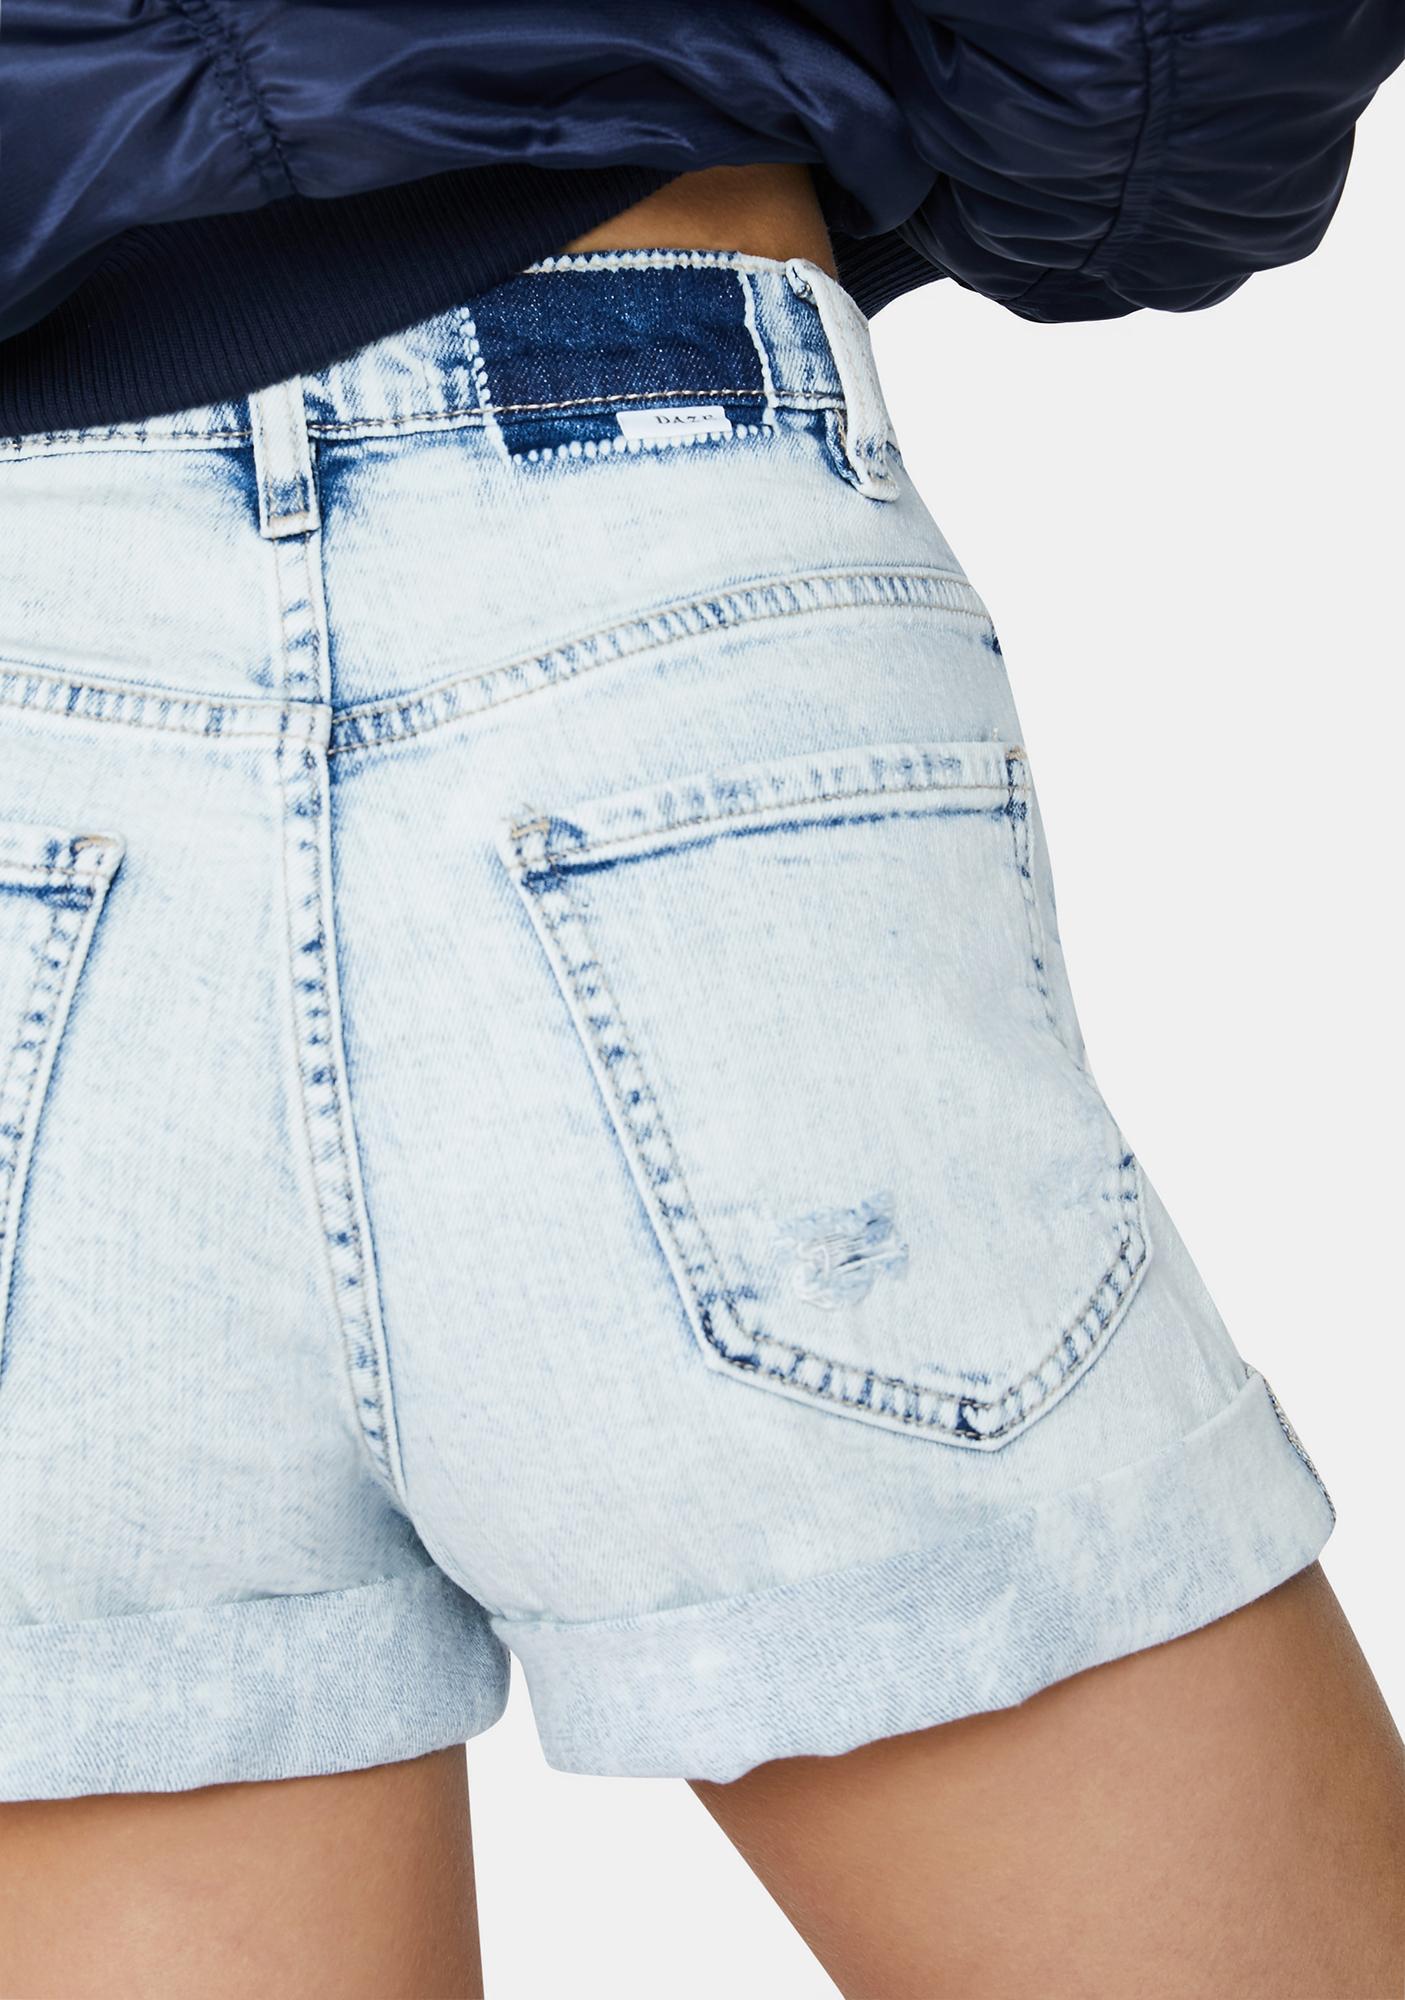 Daze Light Wash Dad's Girl Denim Mom Shorts